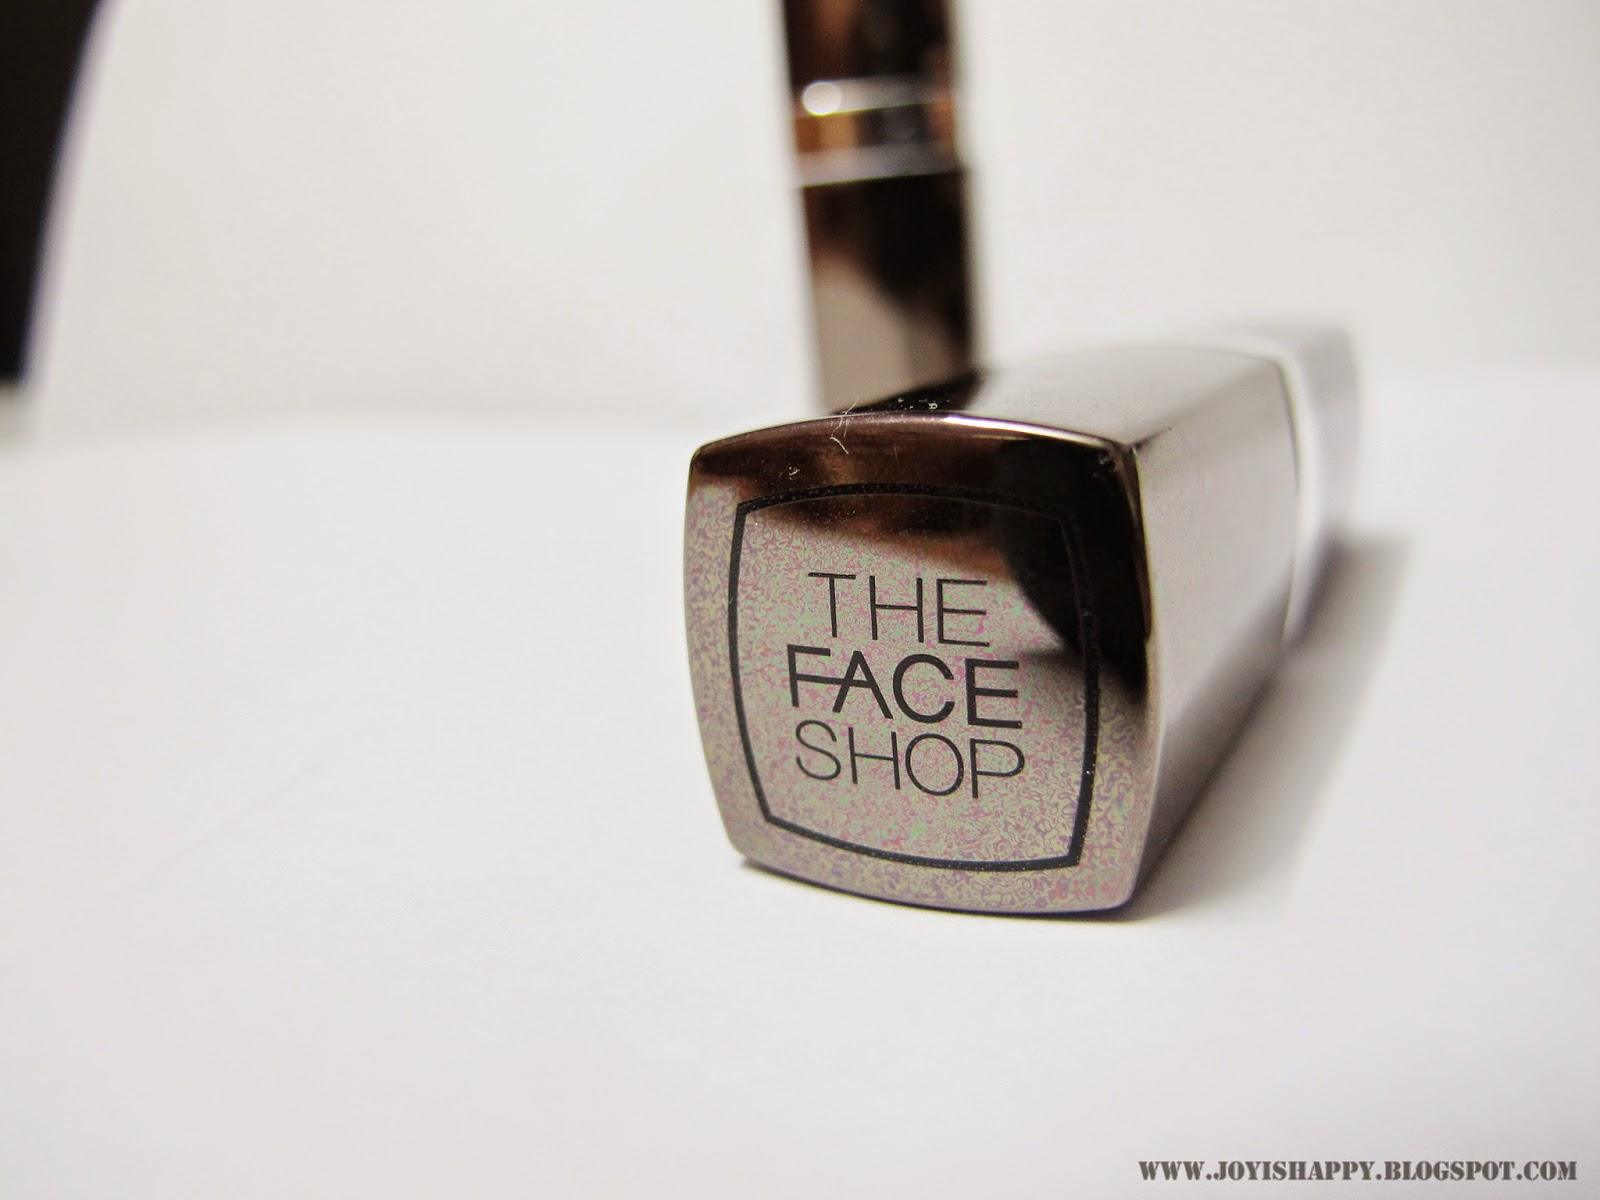 TheFaceShop Black Label Lipsticks